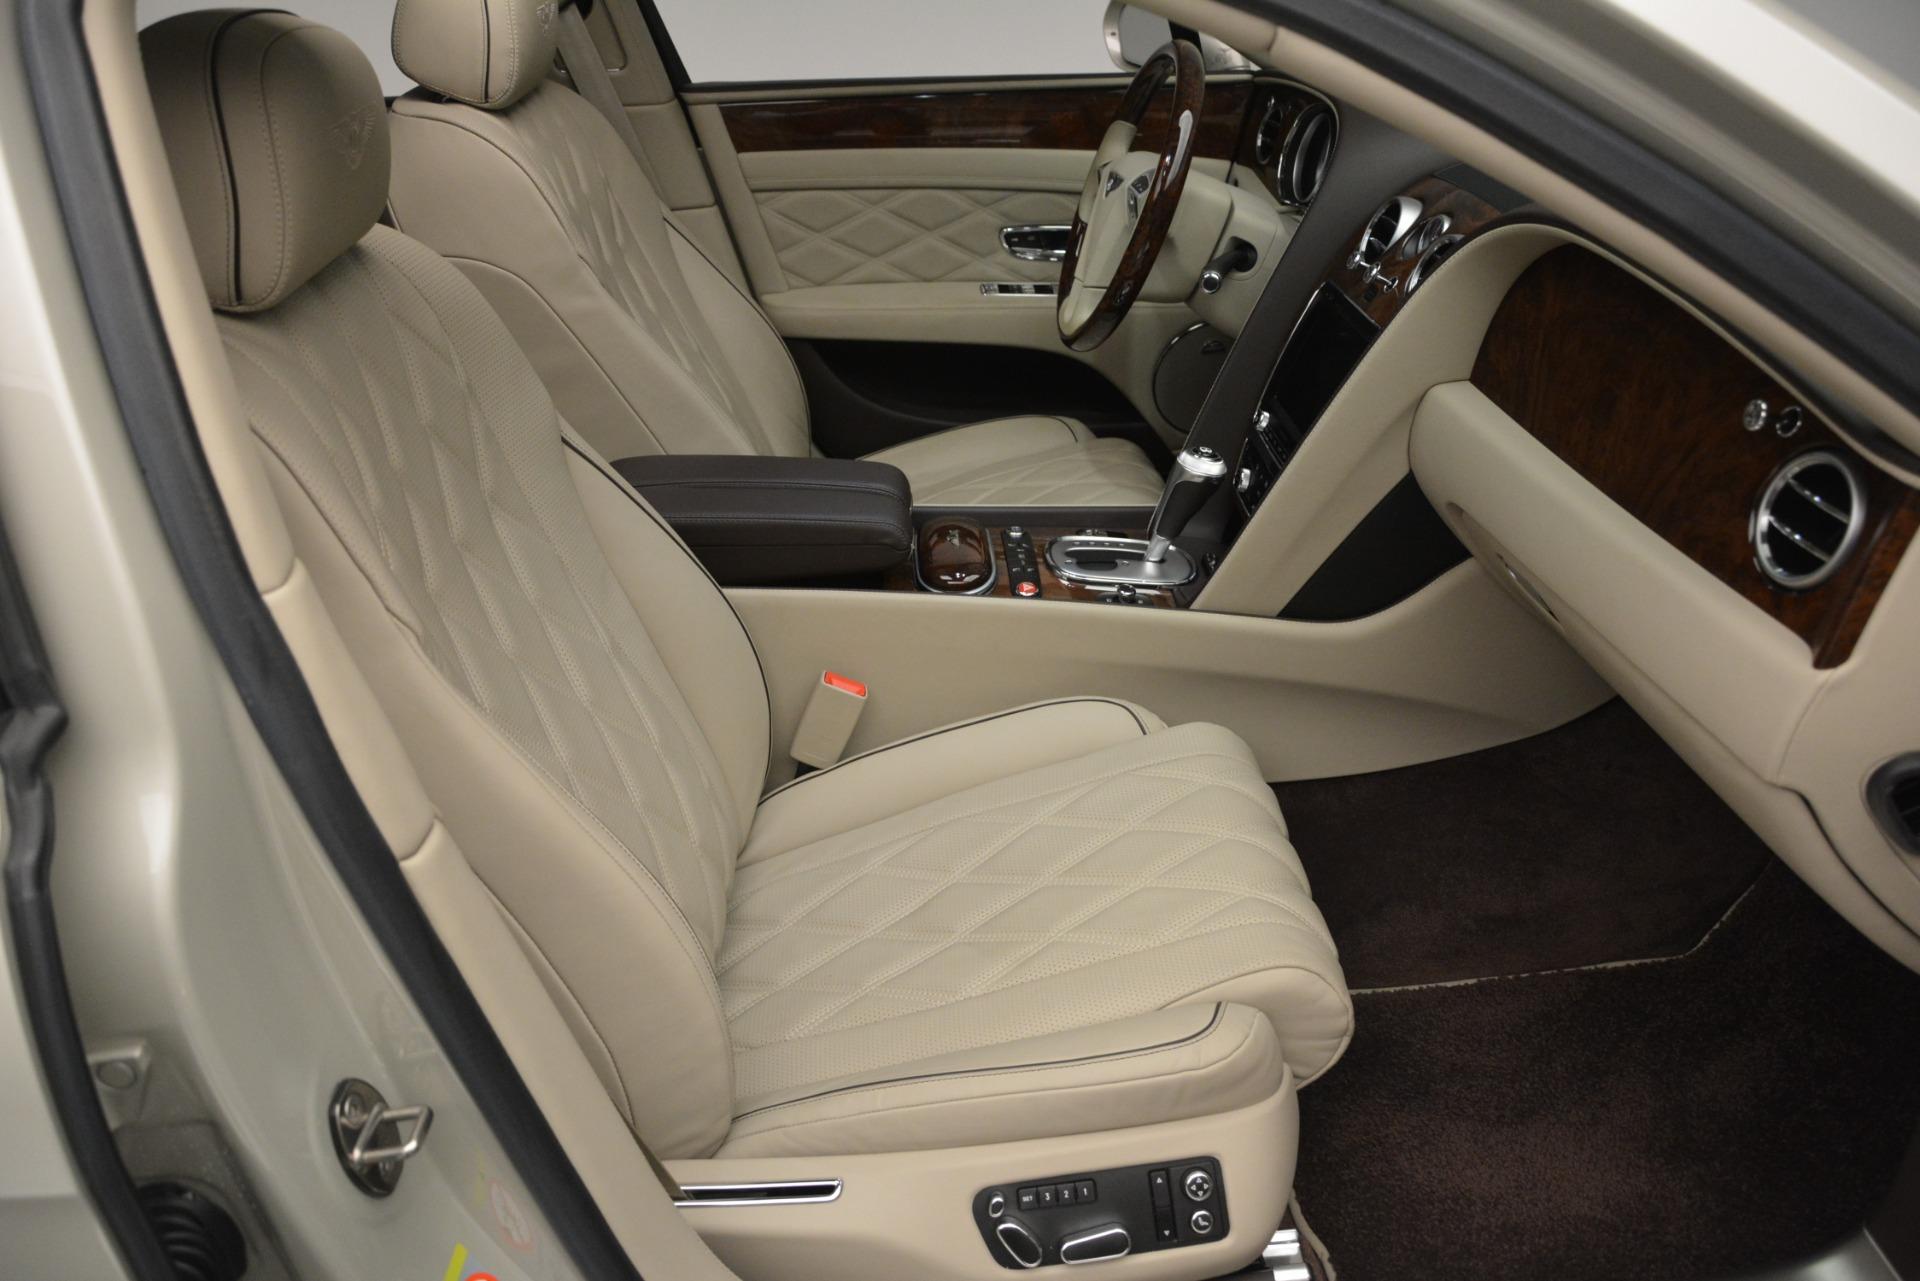 Used 2014 Bentley Flying Spur W12 For Sale In Westport, CT 2624_p27